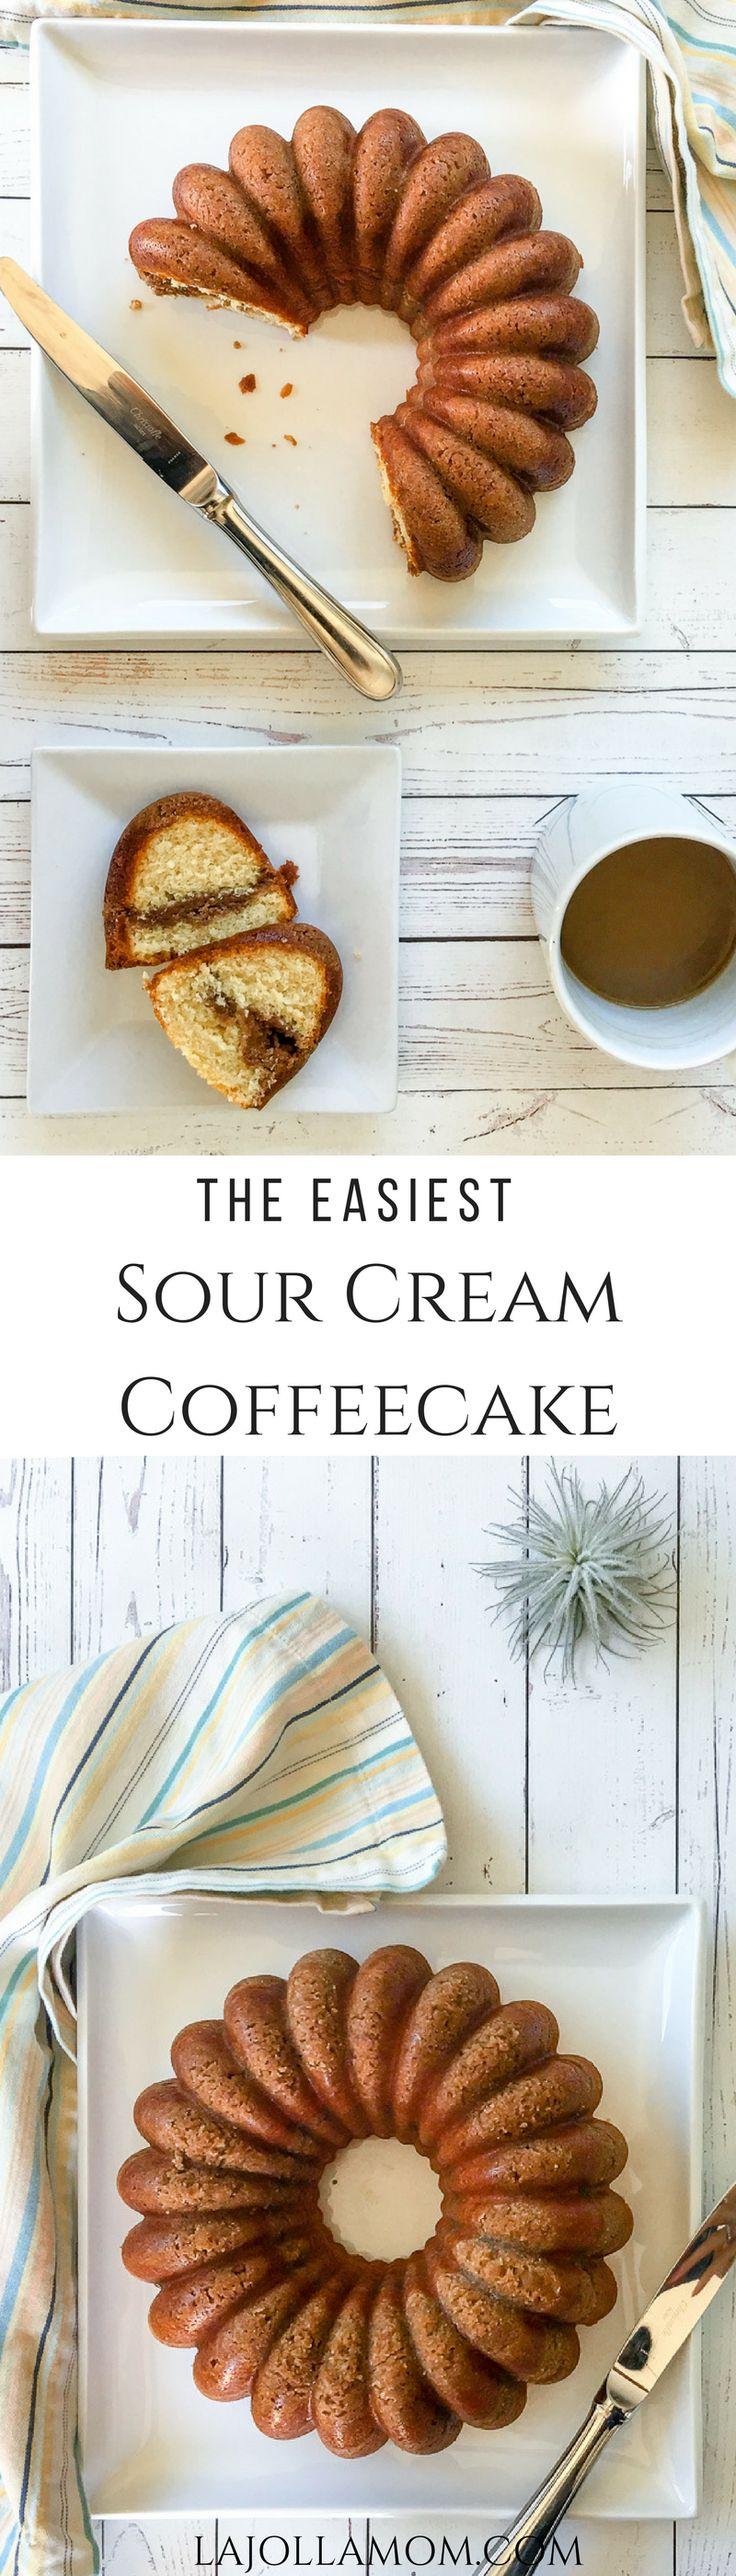 248 best Sunday Brunch images on Pinterest | Healthy eating habits ...